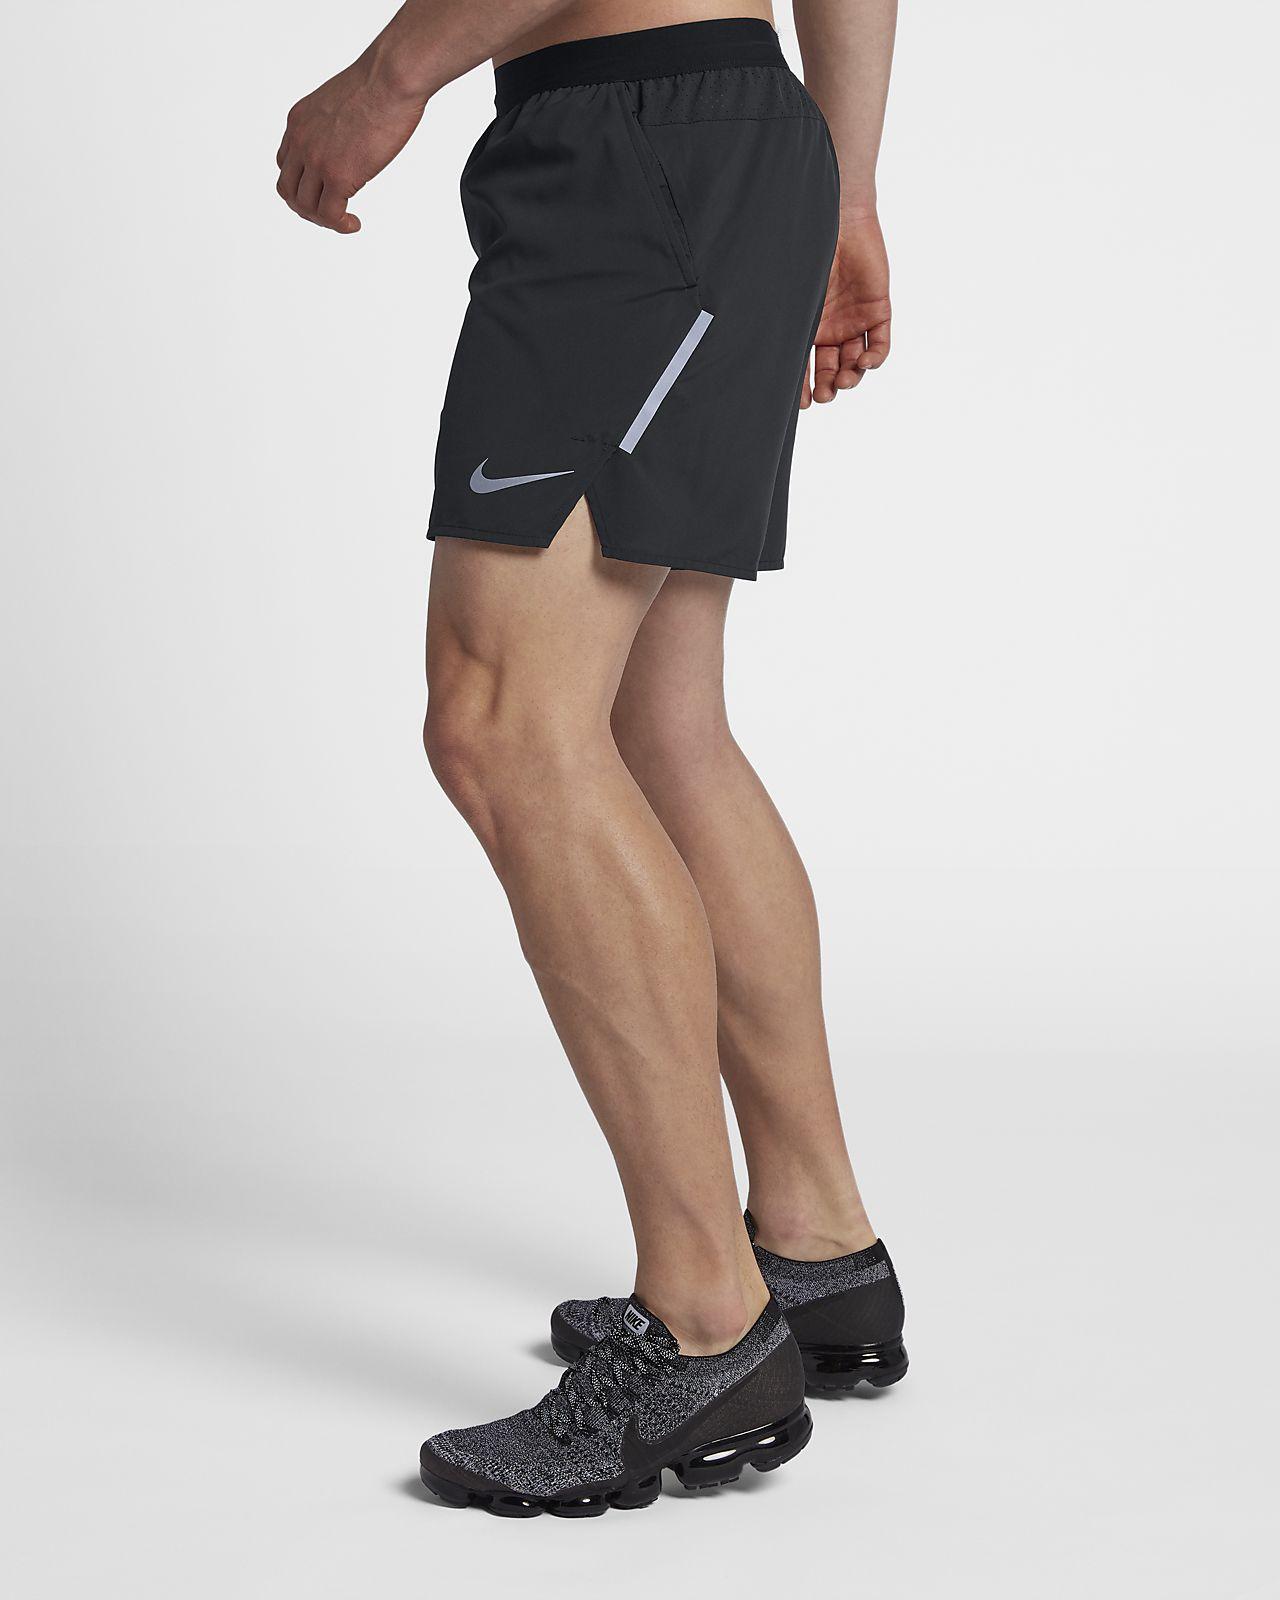 68c2a602df Shorts da running foderati 12,5 cm Nike Flex Stride - Uomo. Nike.com IT